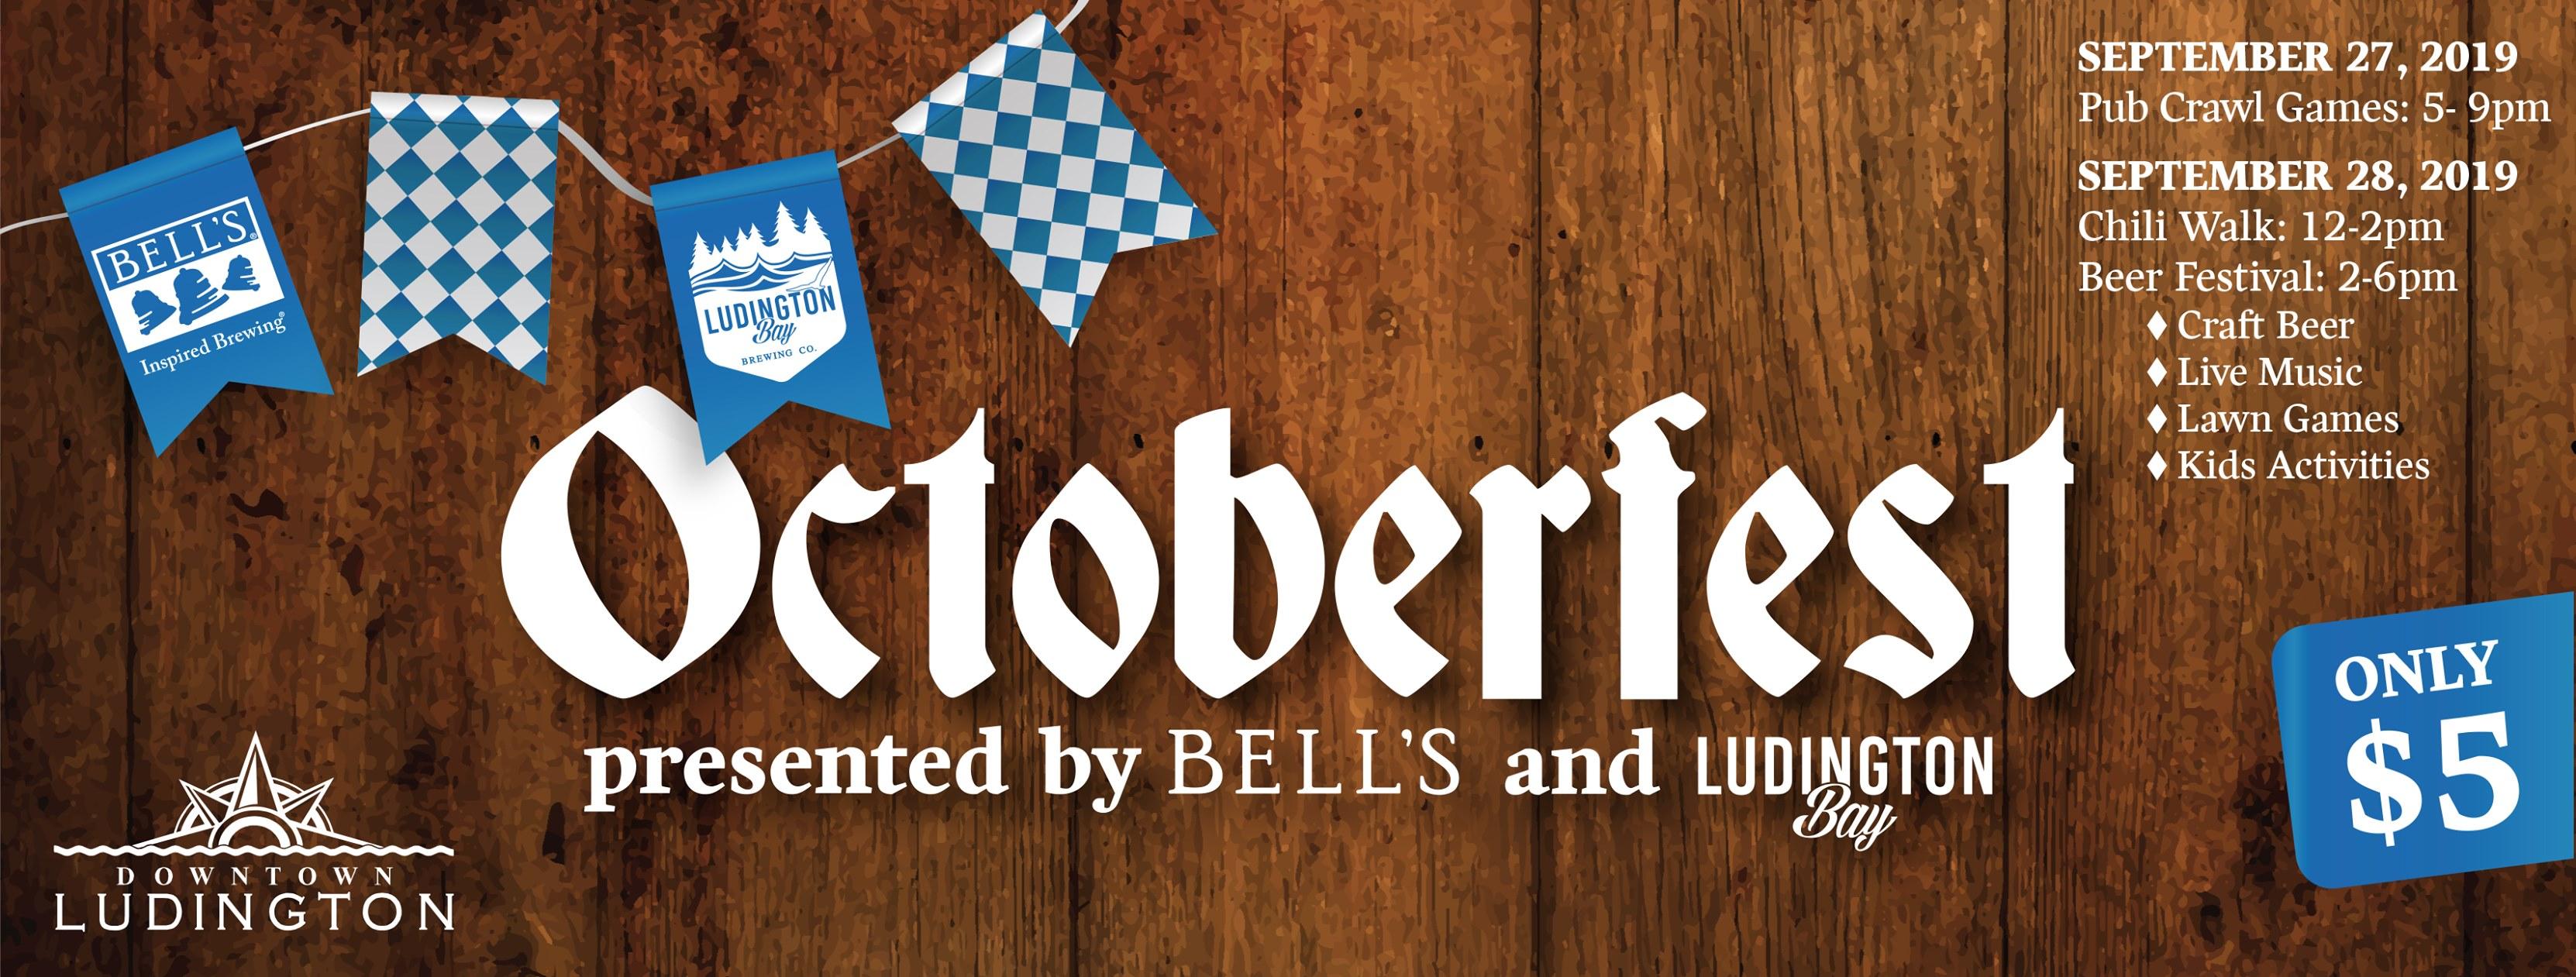 Octoberfestgraphic.jpg